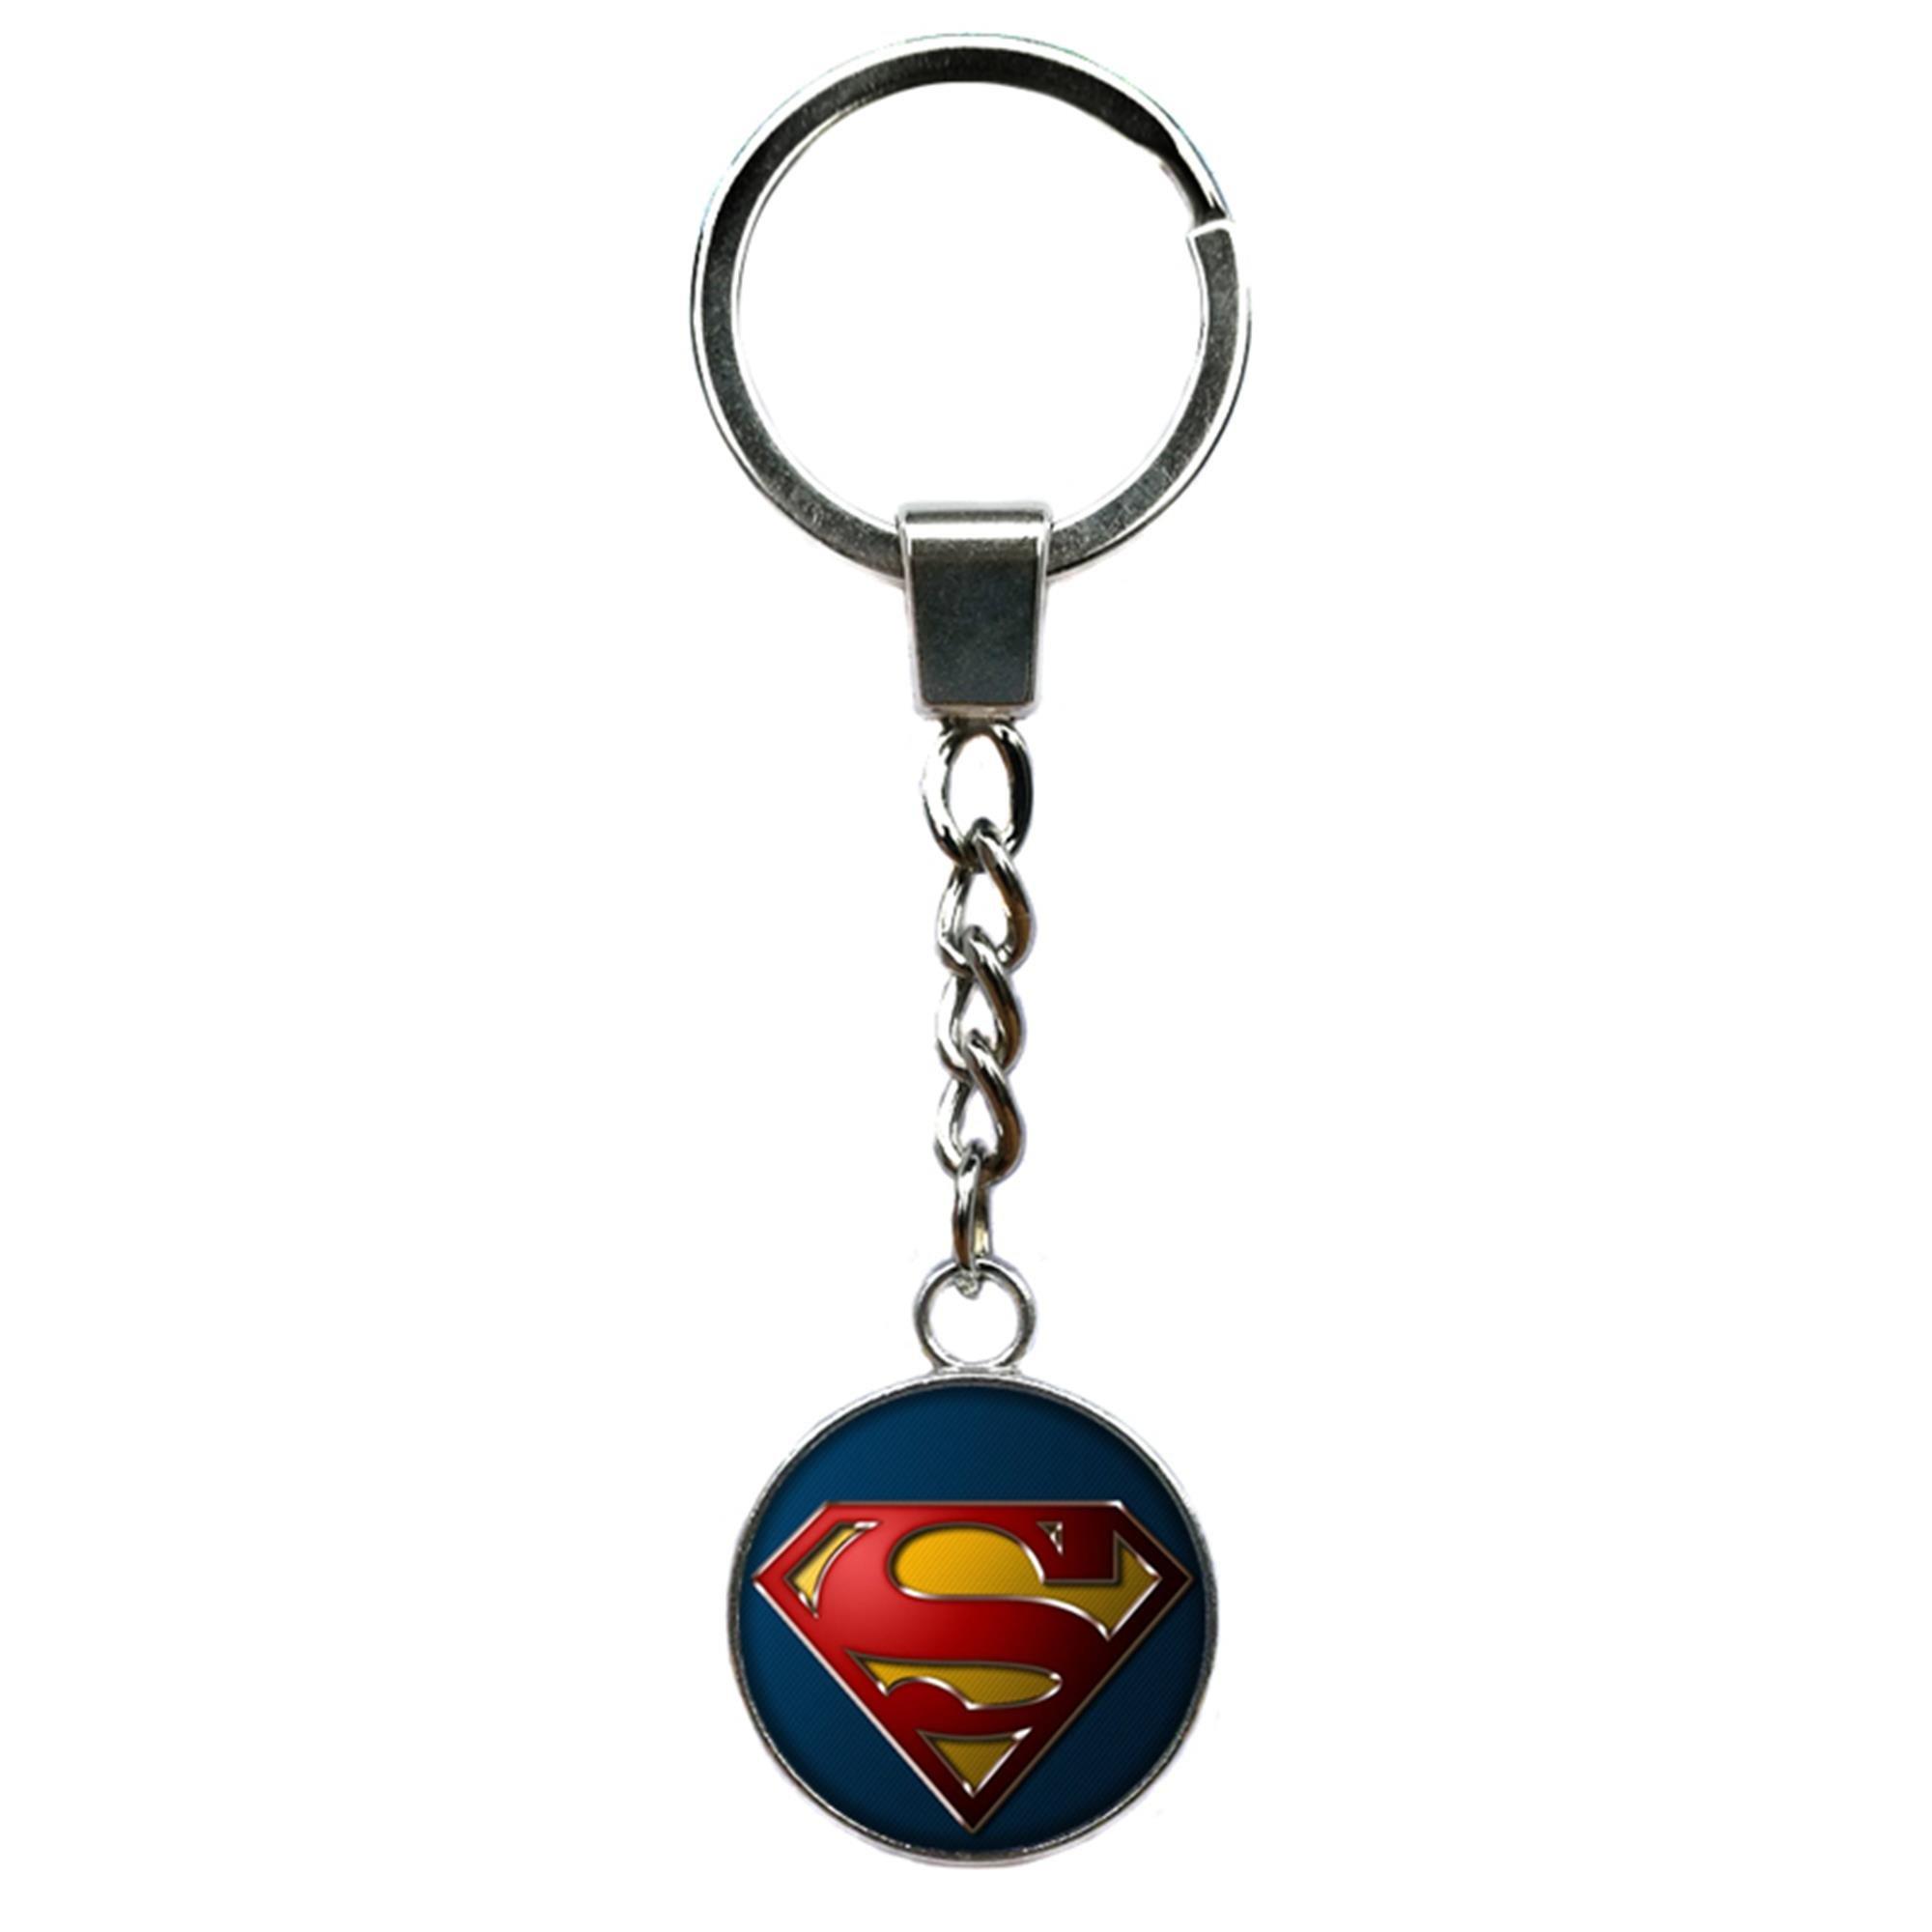 Outlander Brand Superman Premium Quality Silvertone Keychain Key Ring w/Gift Box